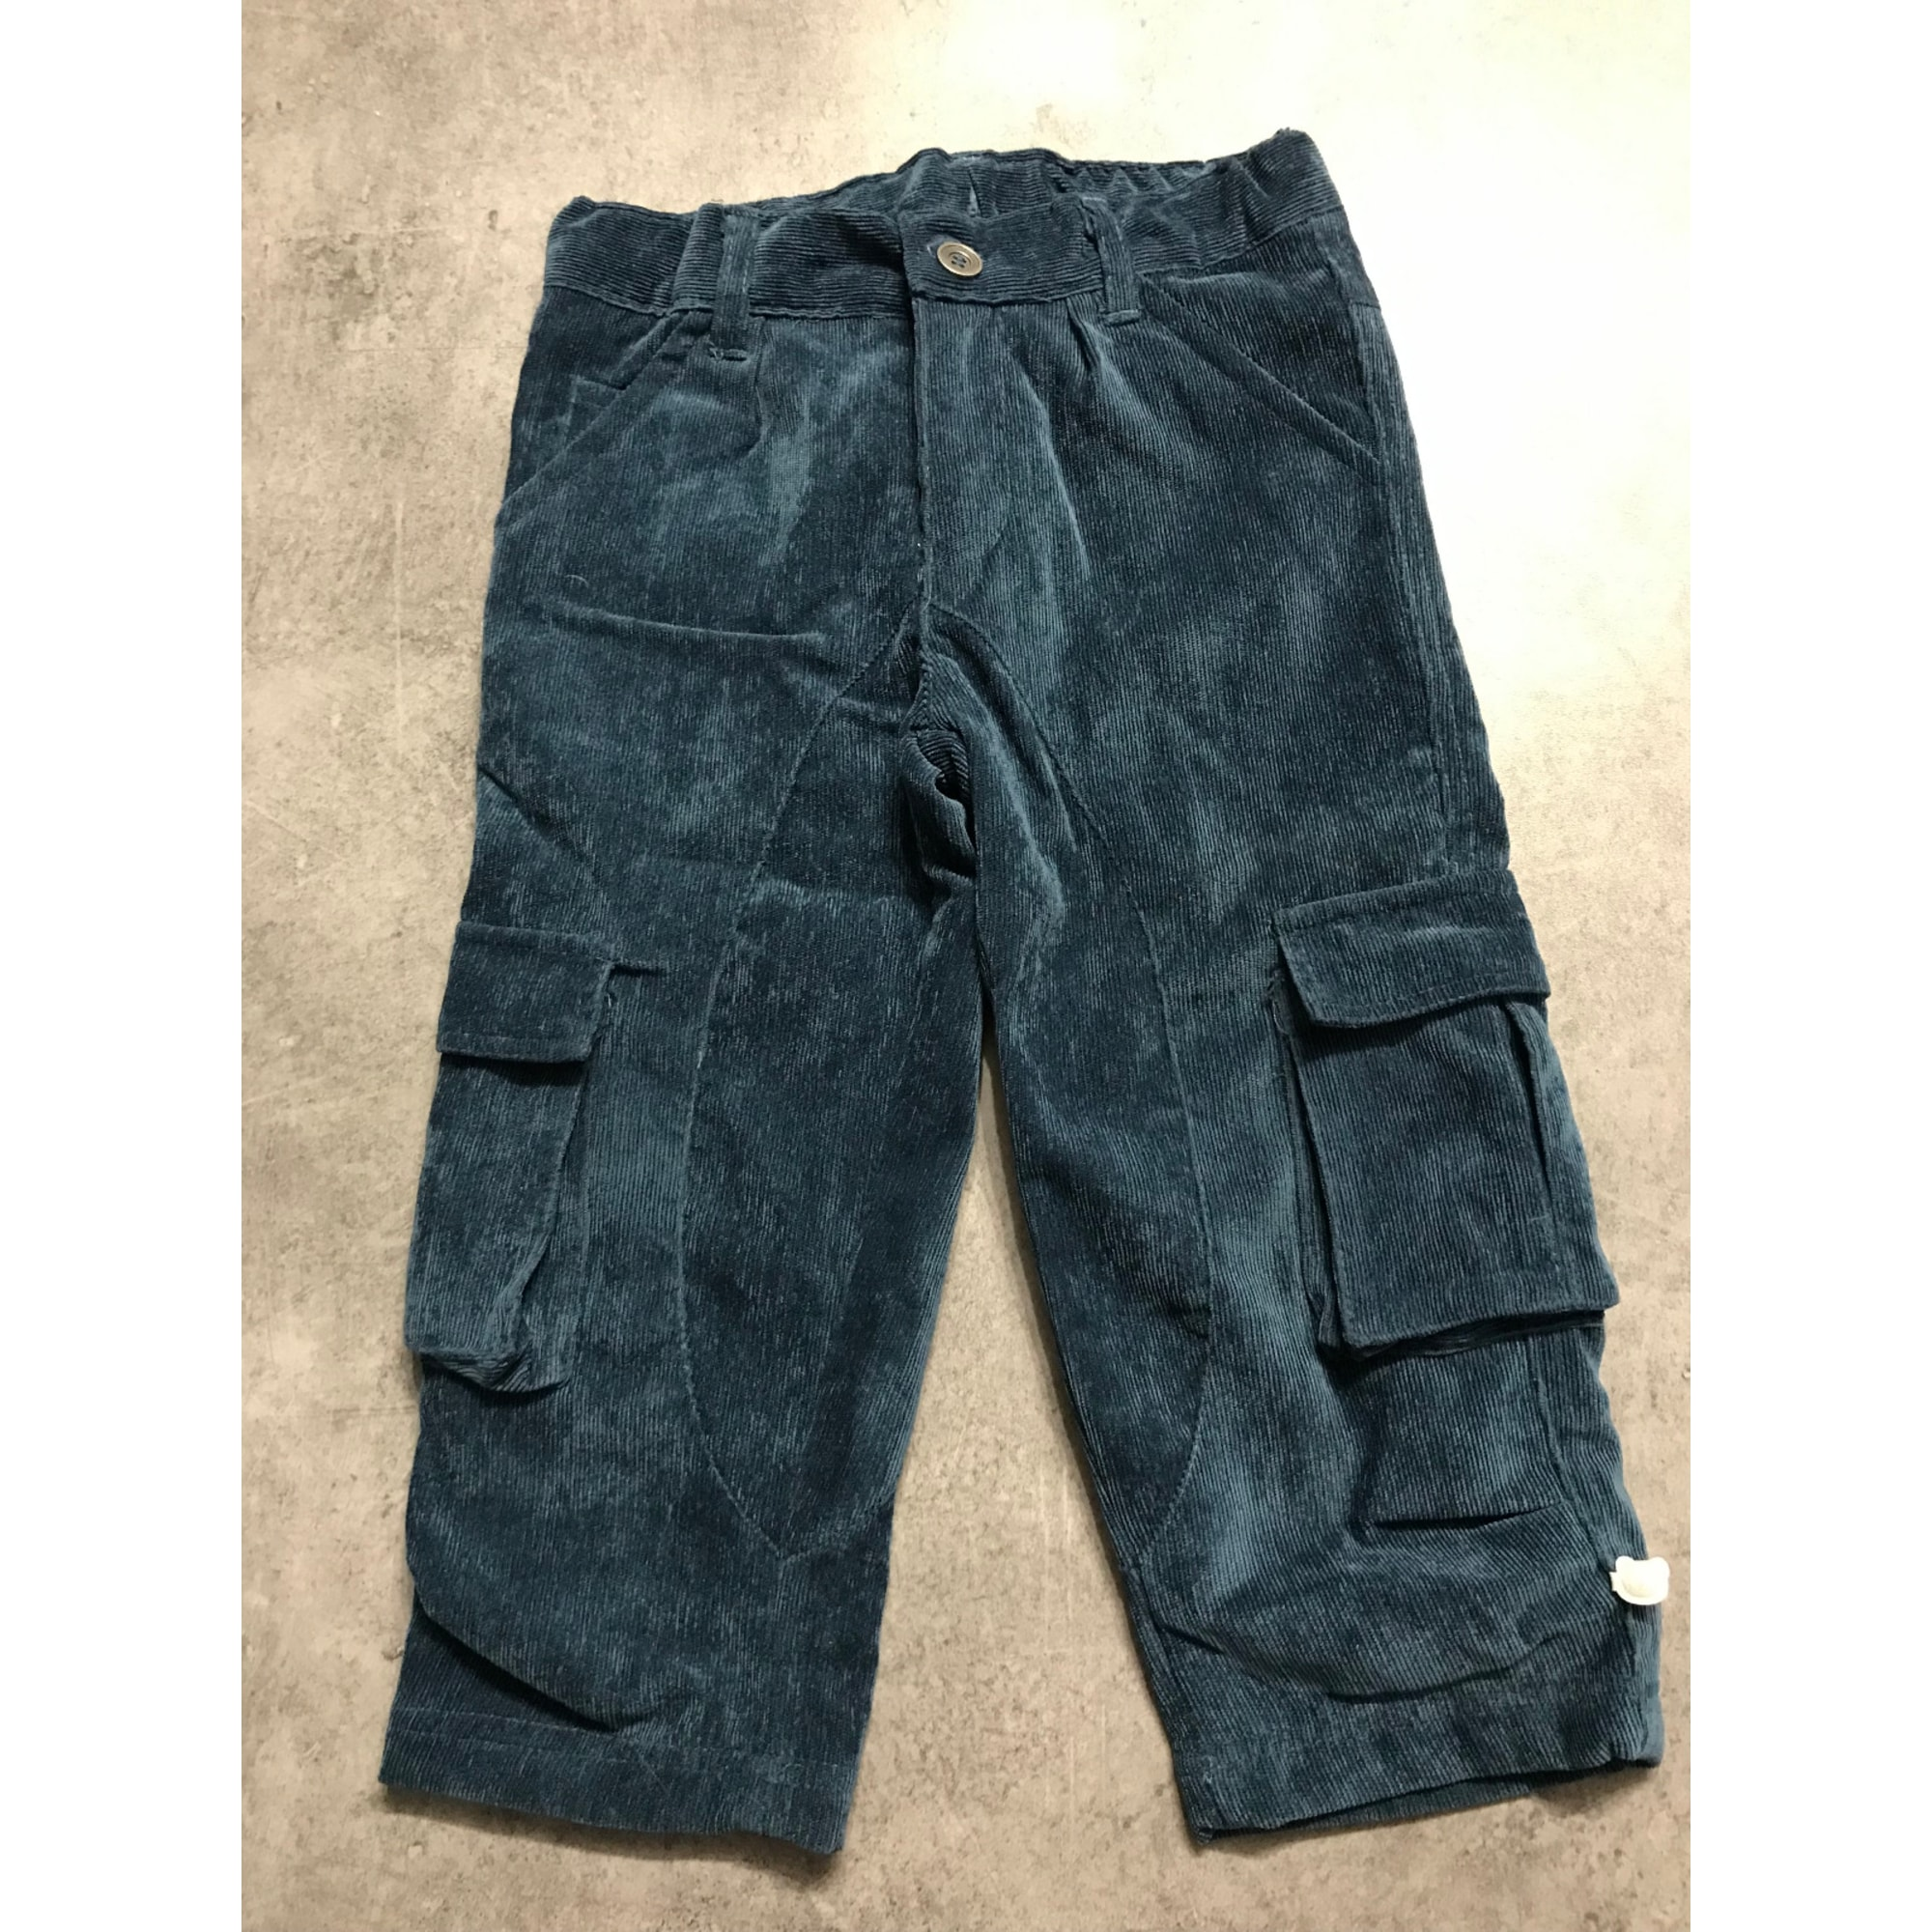 Pantalon NOUKIE'S Bleu, bleu marine, bleu turquoise